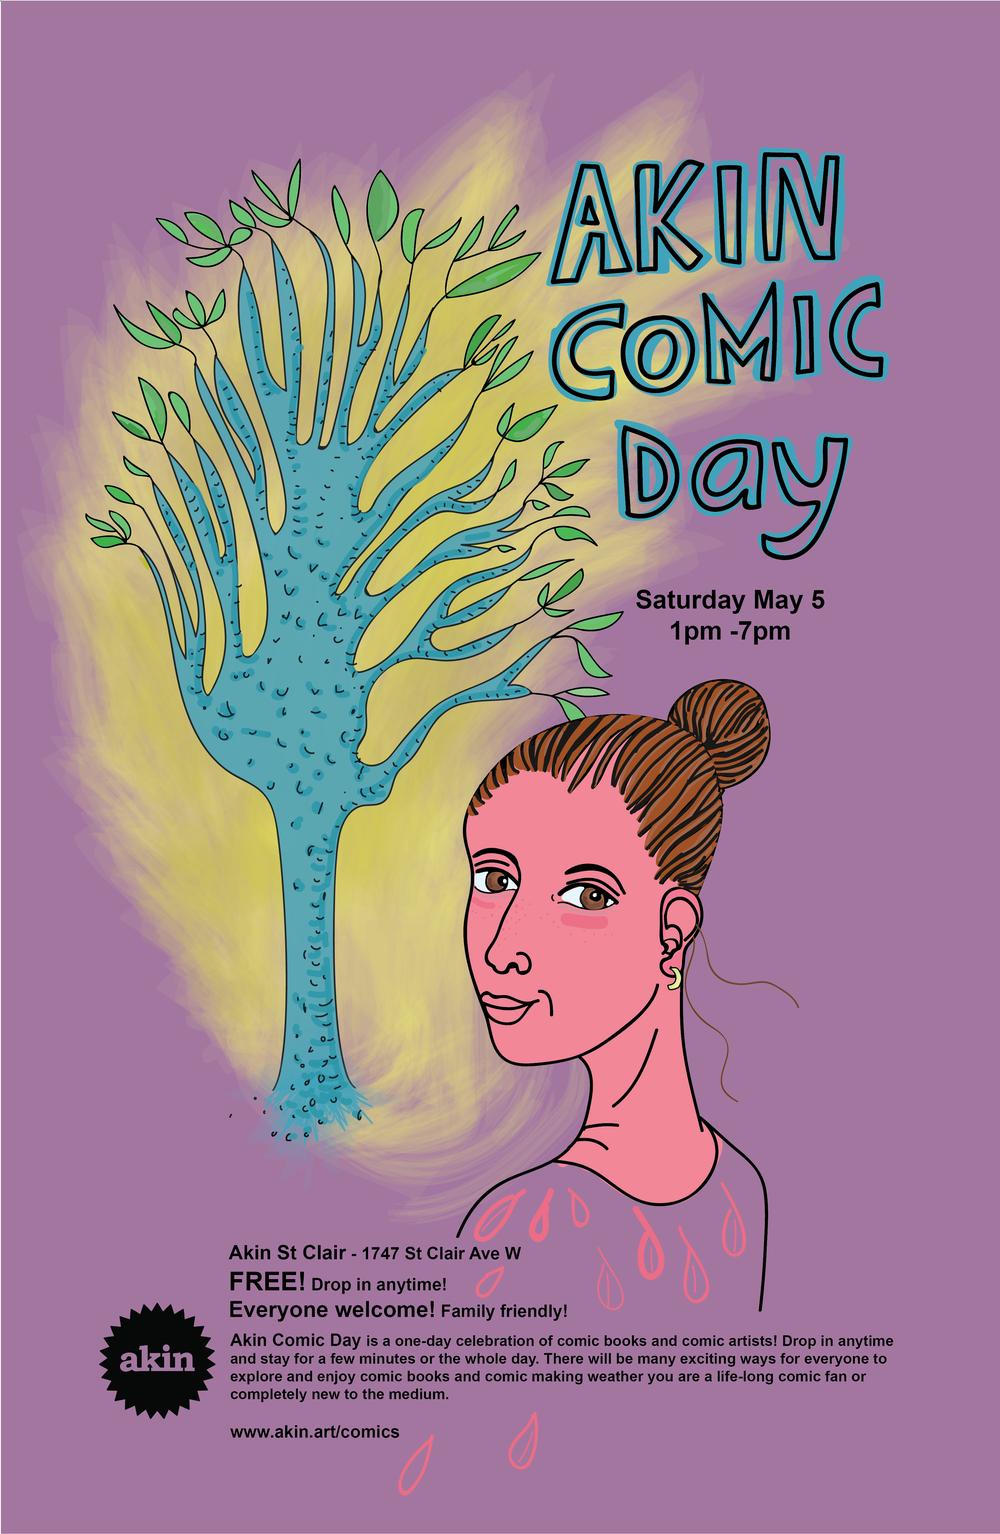 Event Poster by Sarvenaz Rayati of Akin Lansdowne